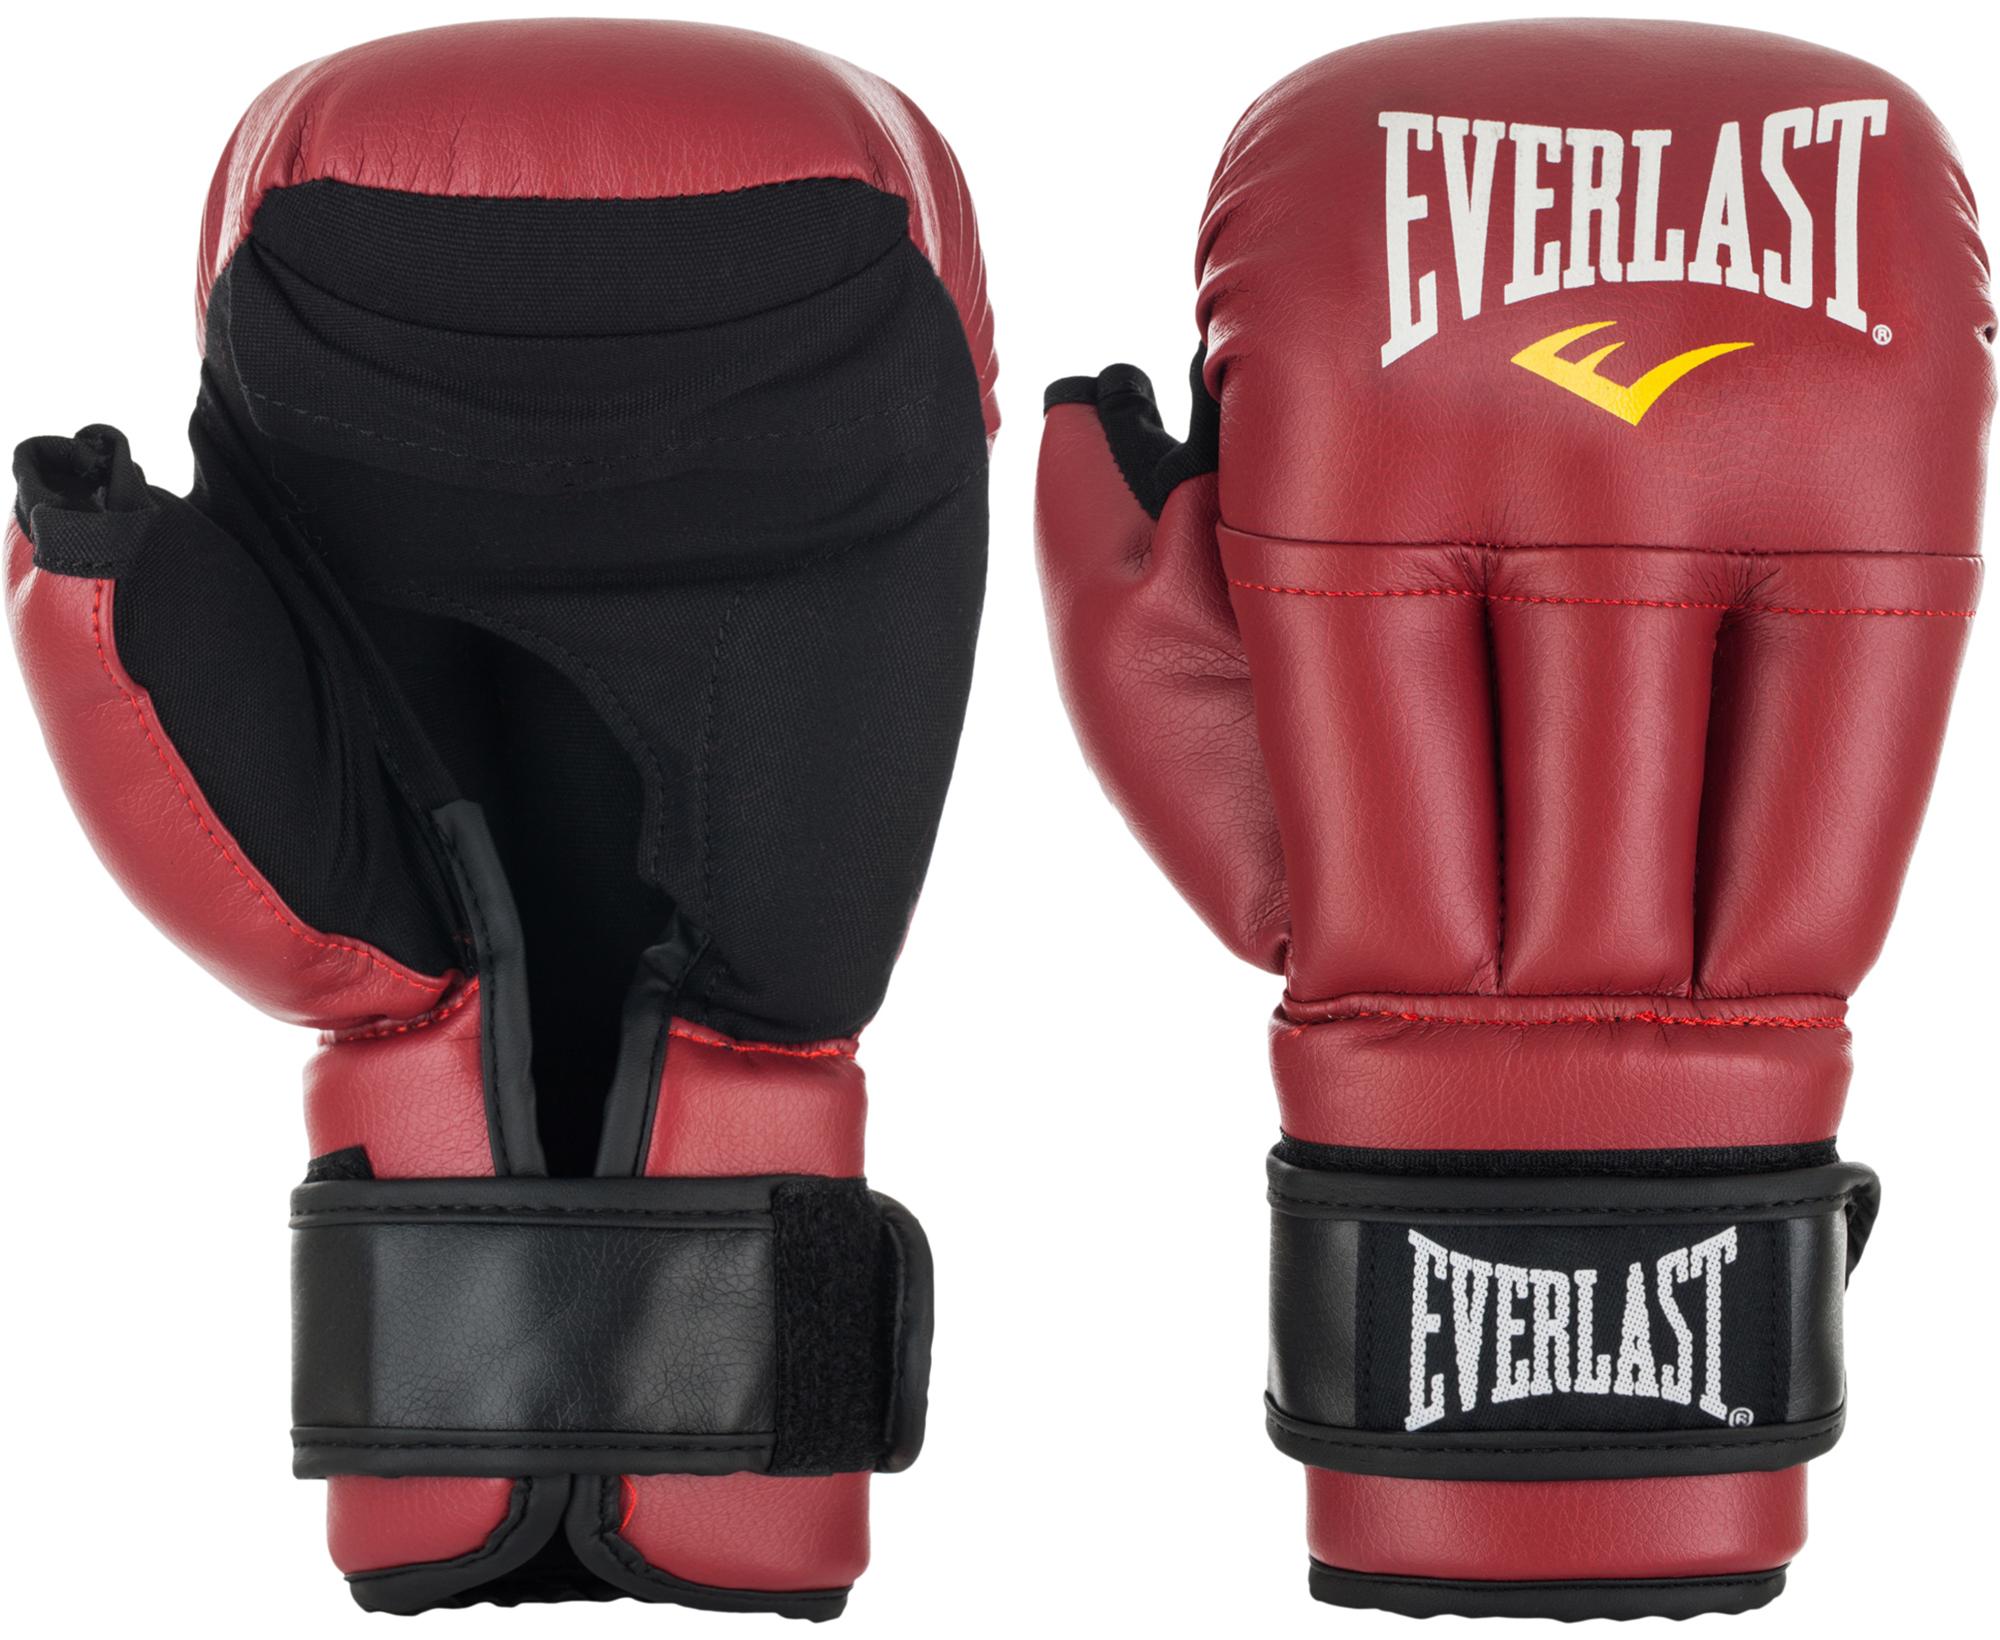 цена на Everlast Перчатки для рукопашного боя Everlast, размер 12 oz